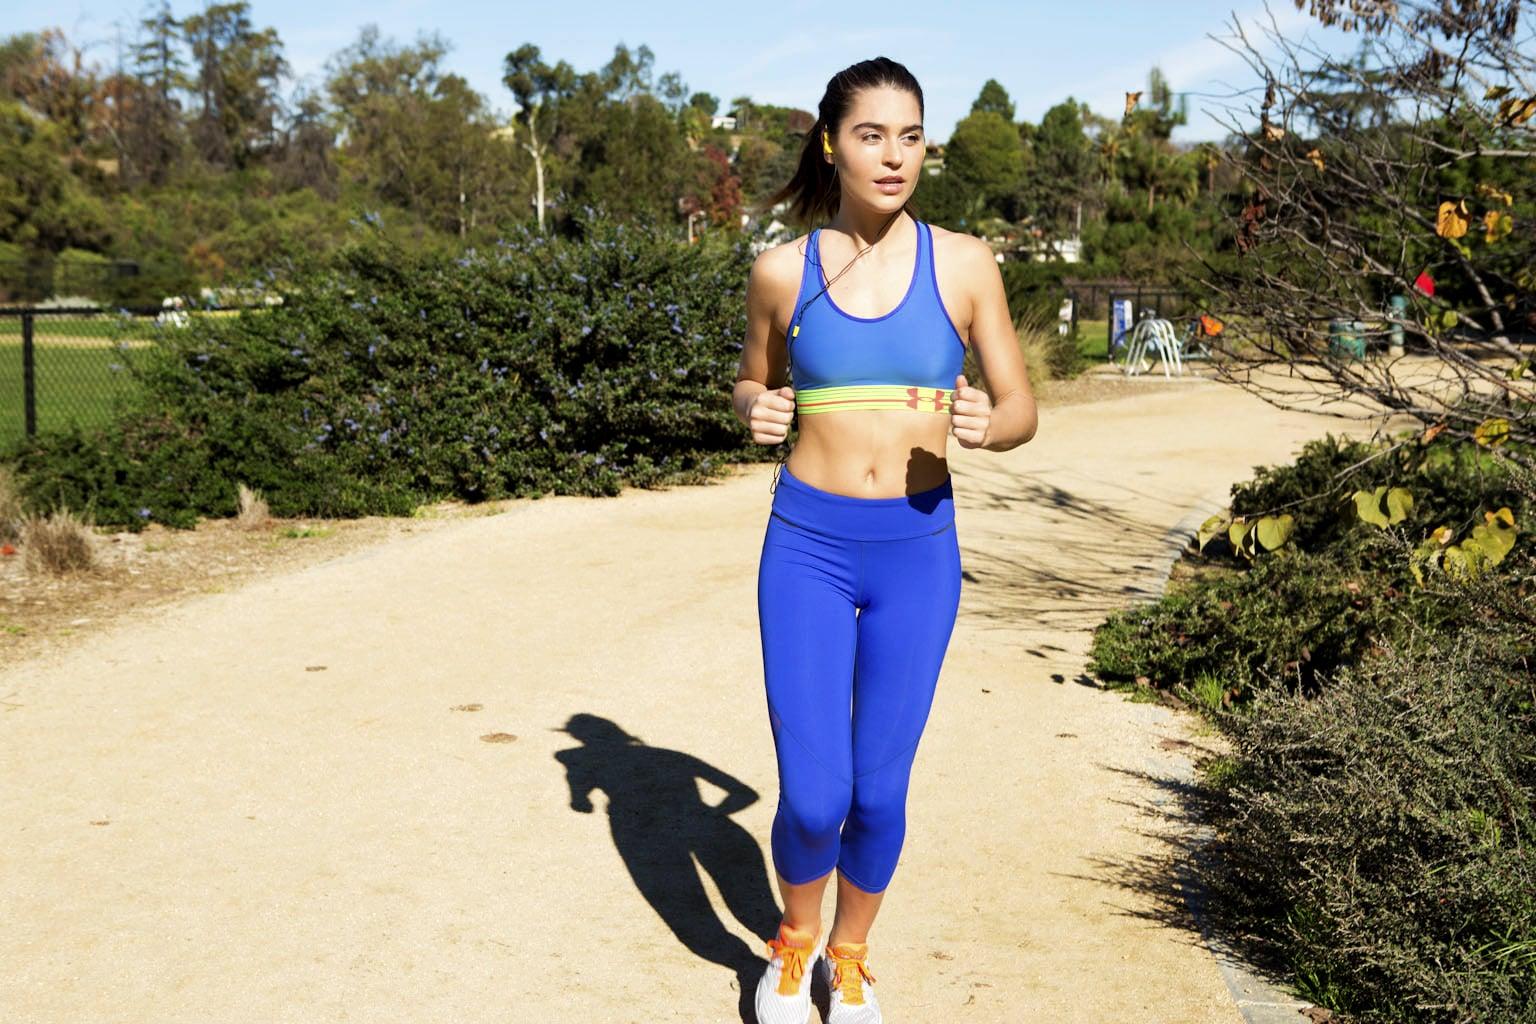 8 Ways Anyone Can Make Running Feel Easier